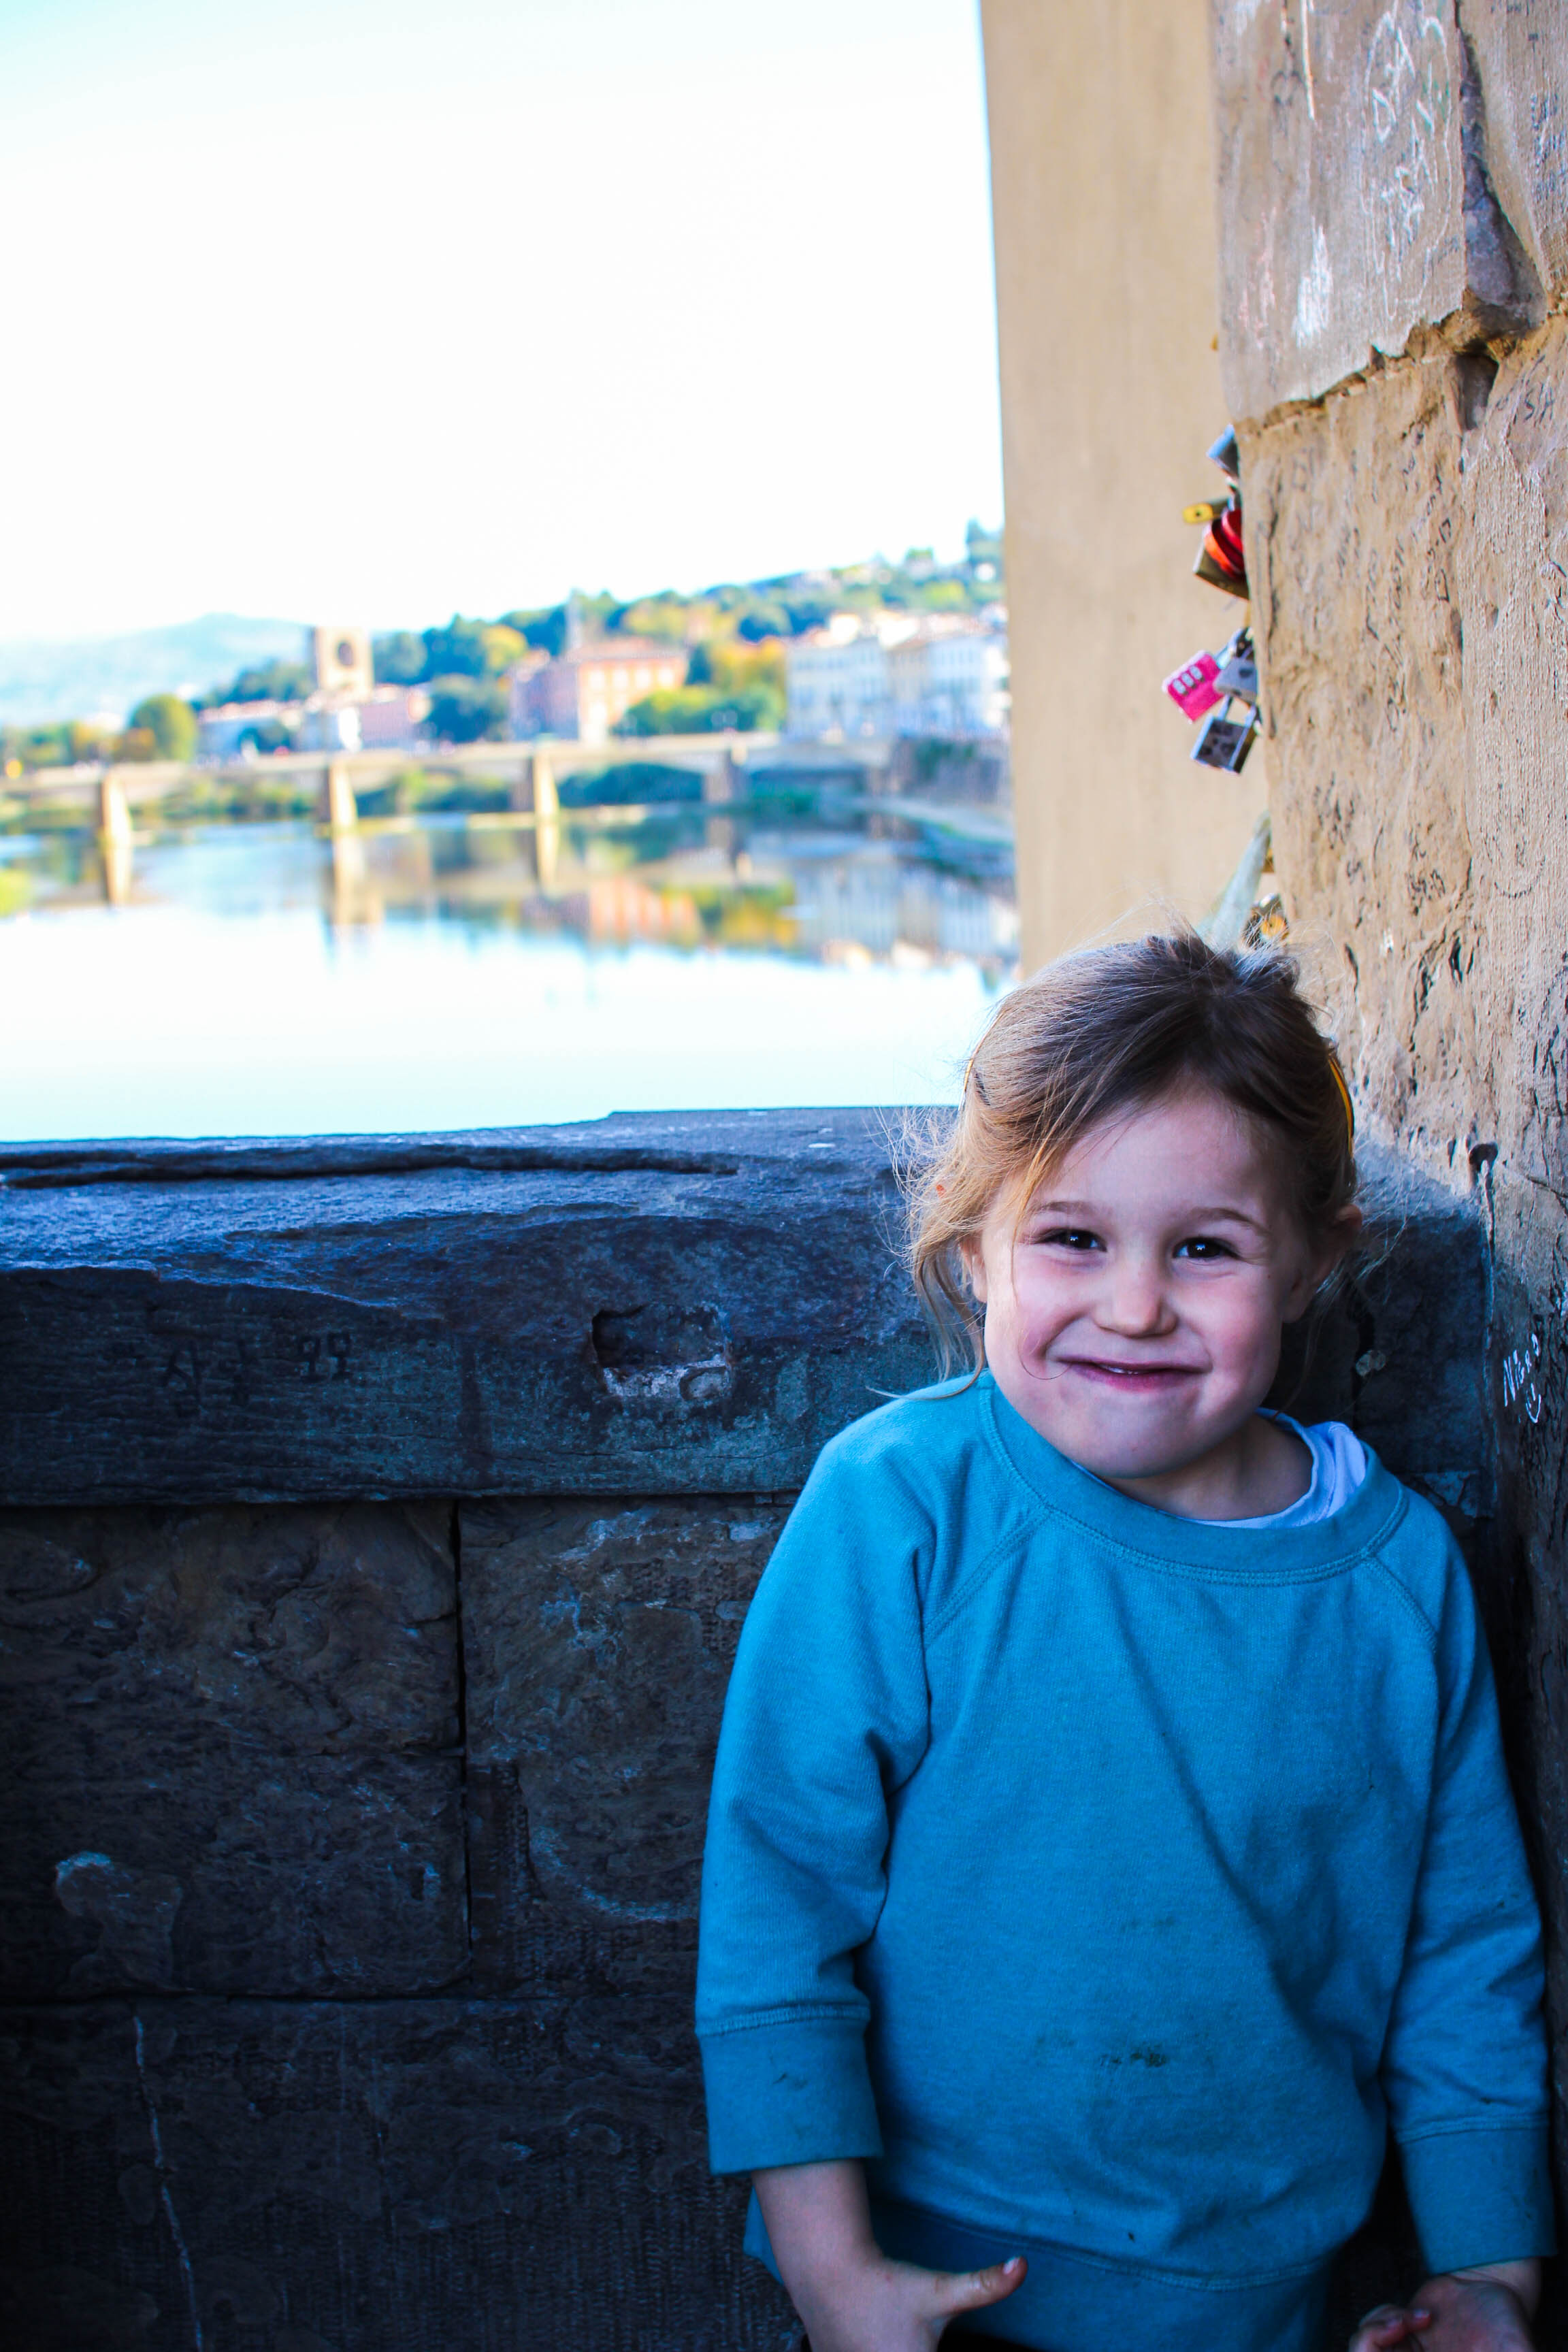 Under the love locks on the Ponte Vecchio